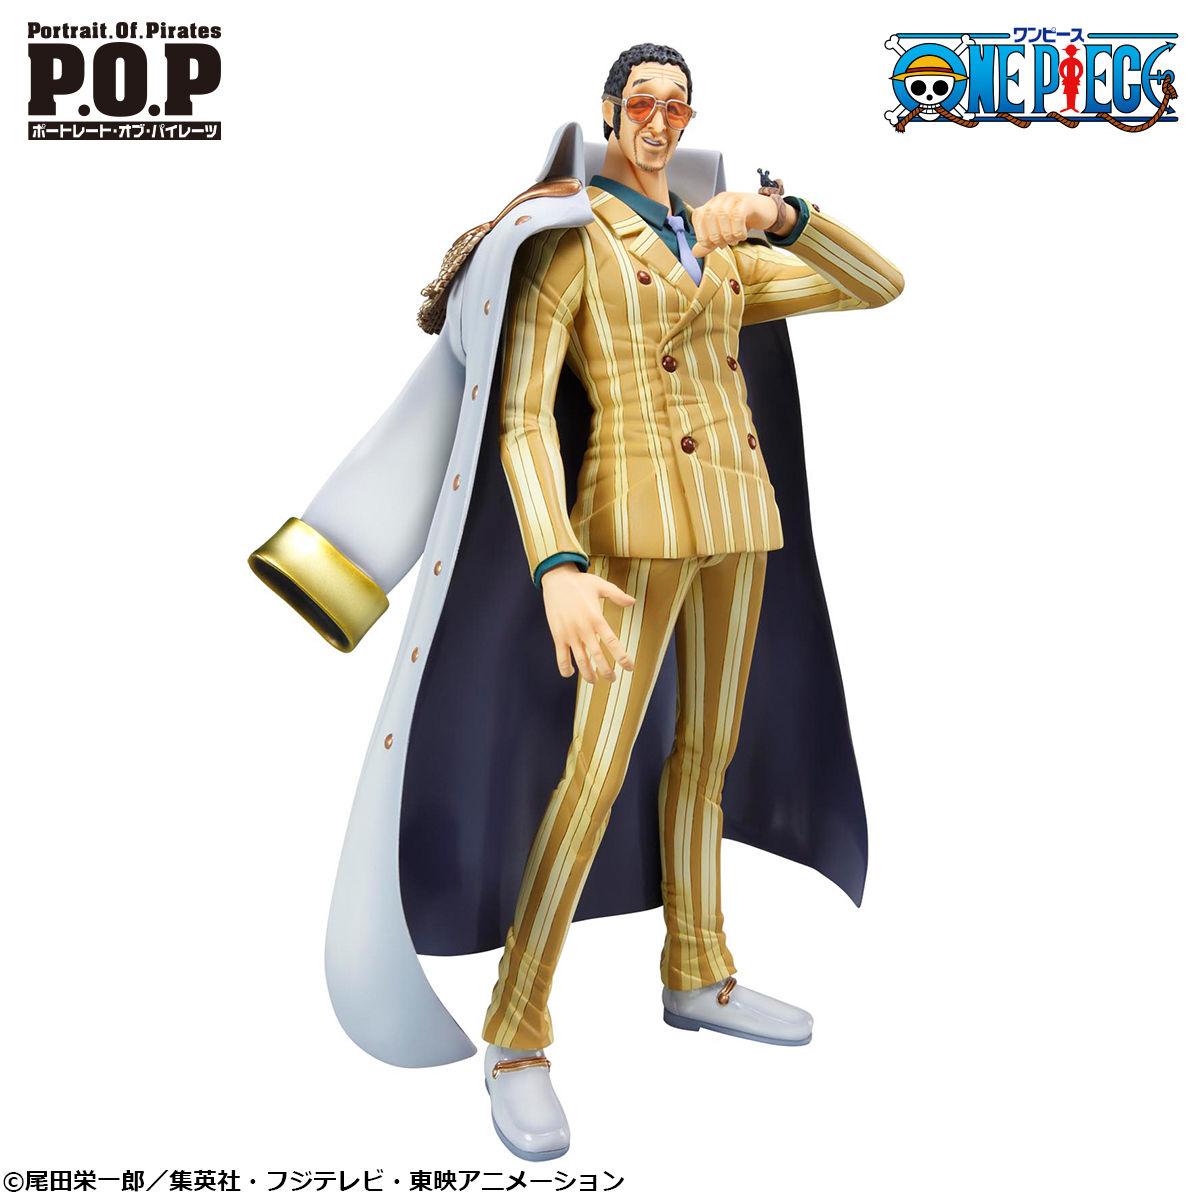 One Piece - Portrait of Pirates NEO-DX Kizaru Borsalino (Reissue) (Limited Pre-order)